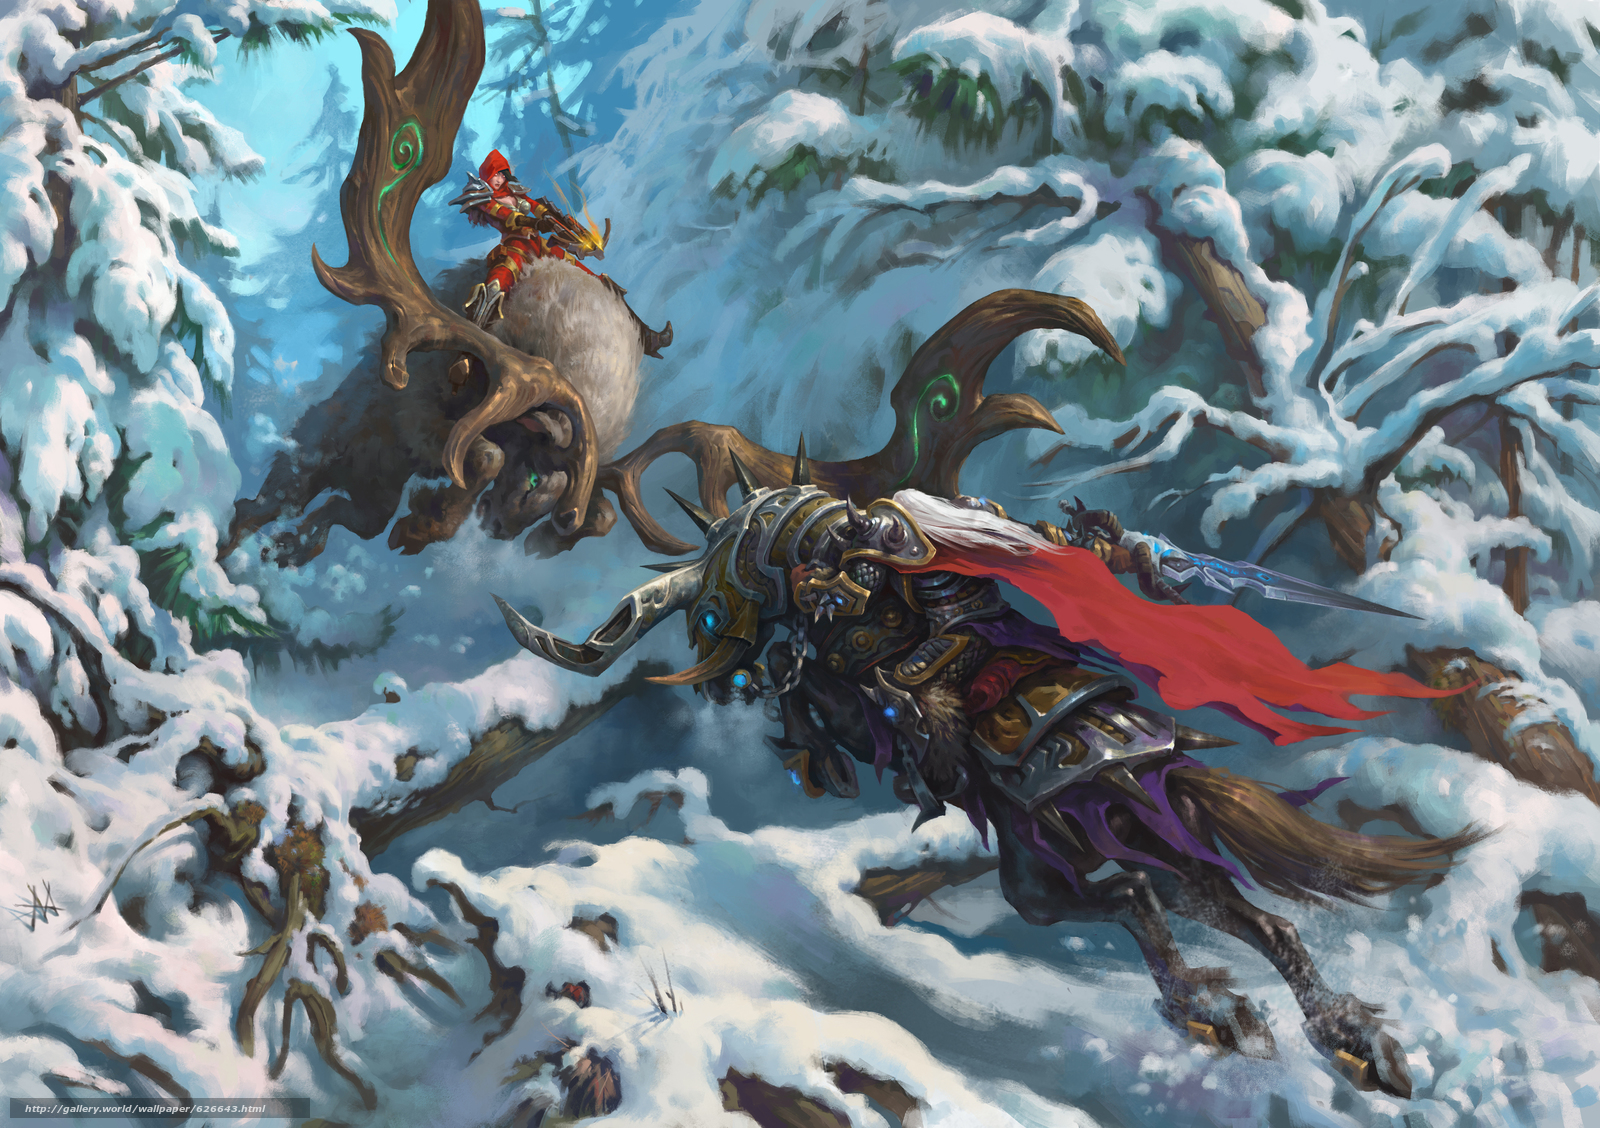 Heroes of the Storm, Arthas, The Lich King, Valla, Demon Hunter, Артас, Король-лич, Валла, Охотница на демонов, сражение, битва, зима, снег